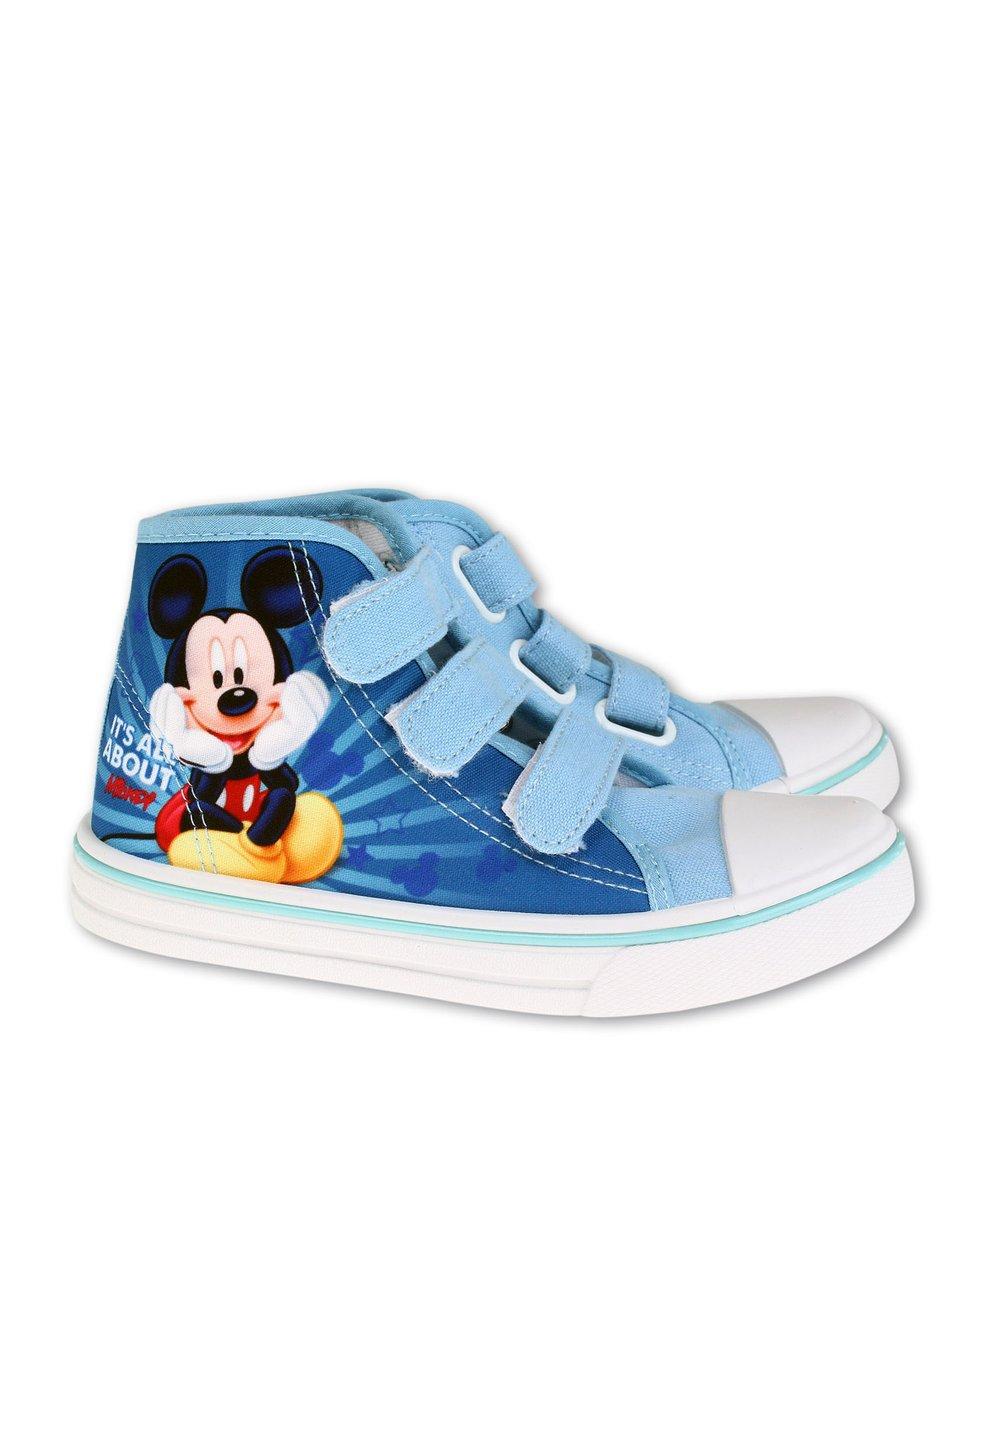 Incaltaminte panza, All about Mickey, albastru deschis imagine